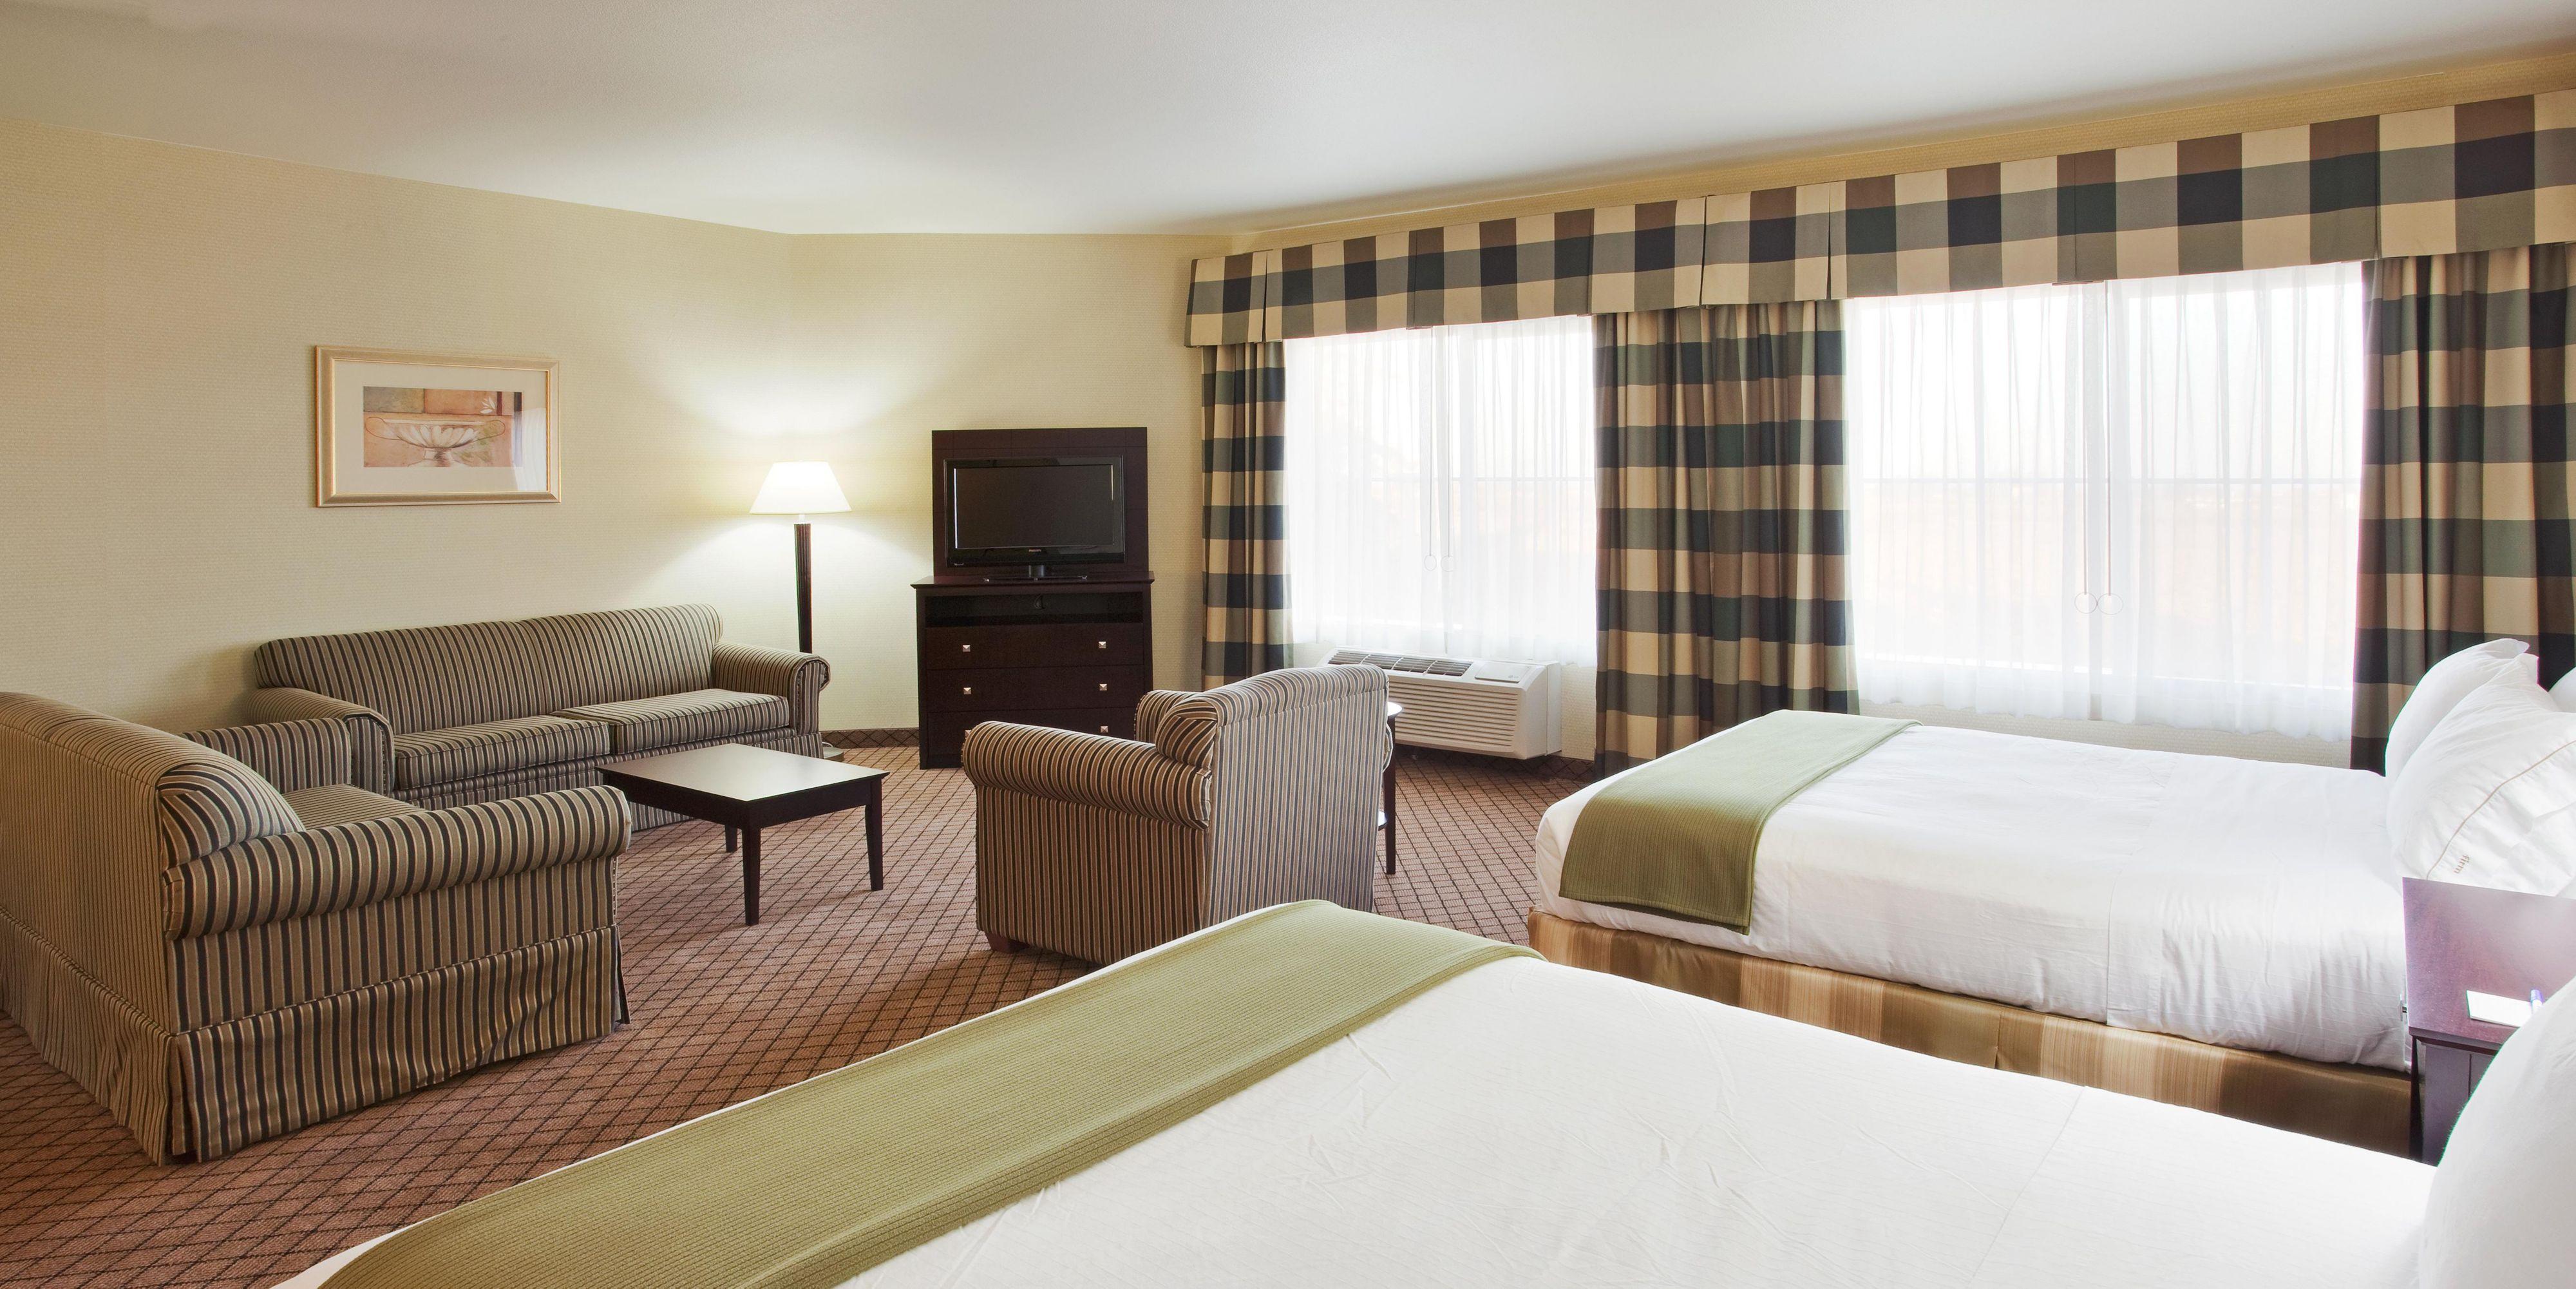 Holiday Inn Express Lodi 4288188129 2x1